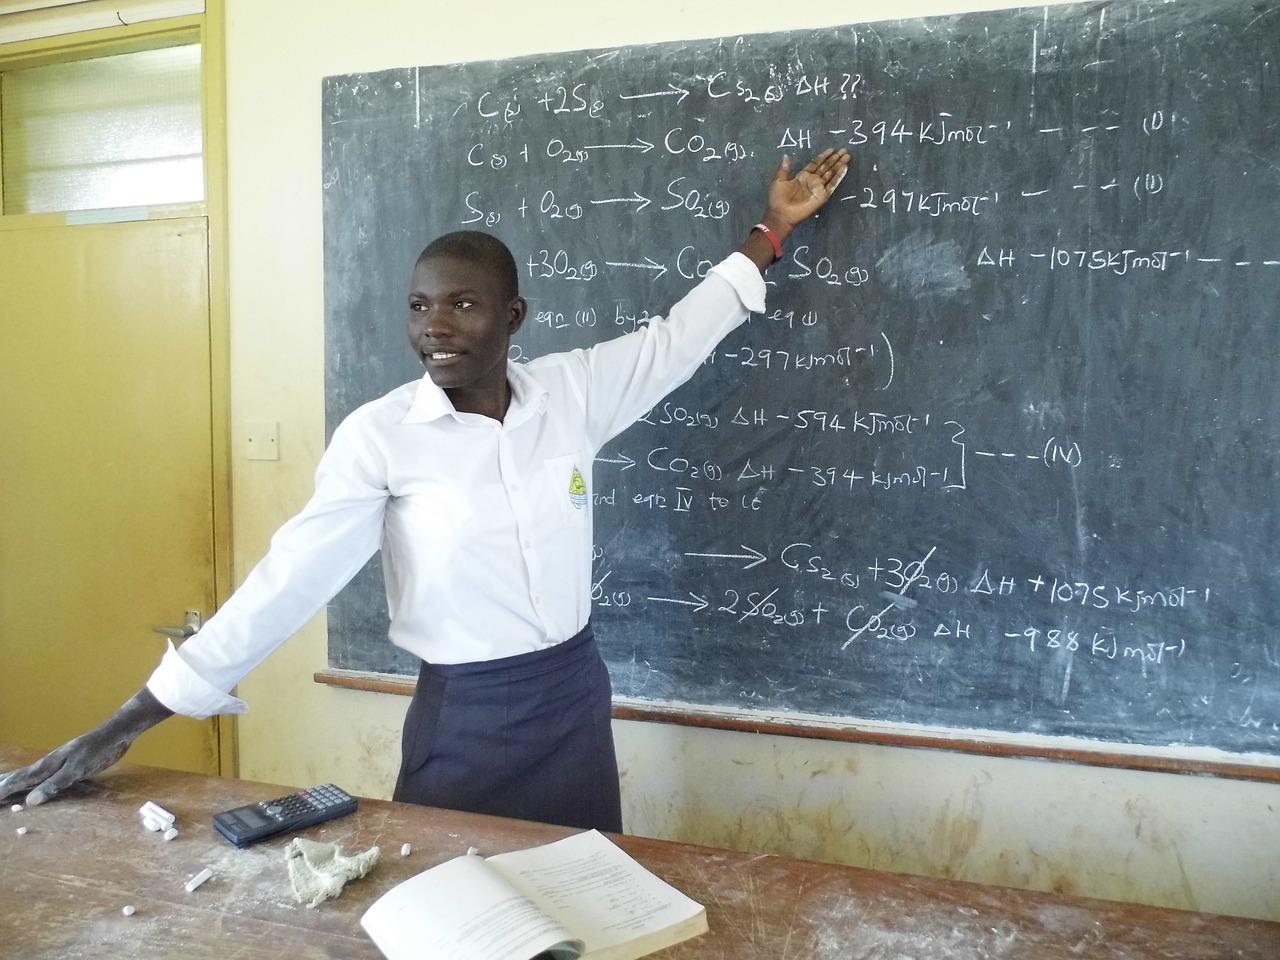 Kenya: KDF airlifts teachers to schools in Lamu in terror attack area of Lamu